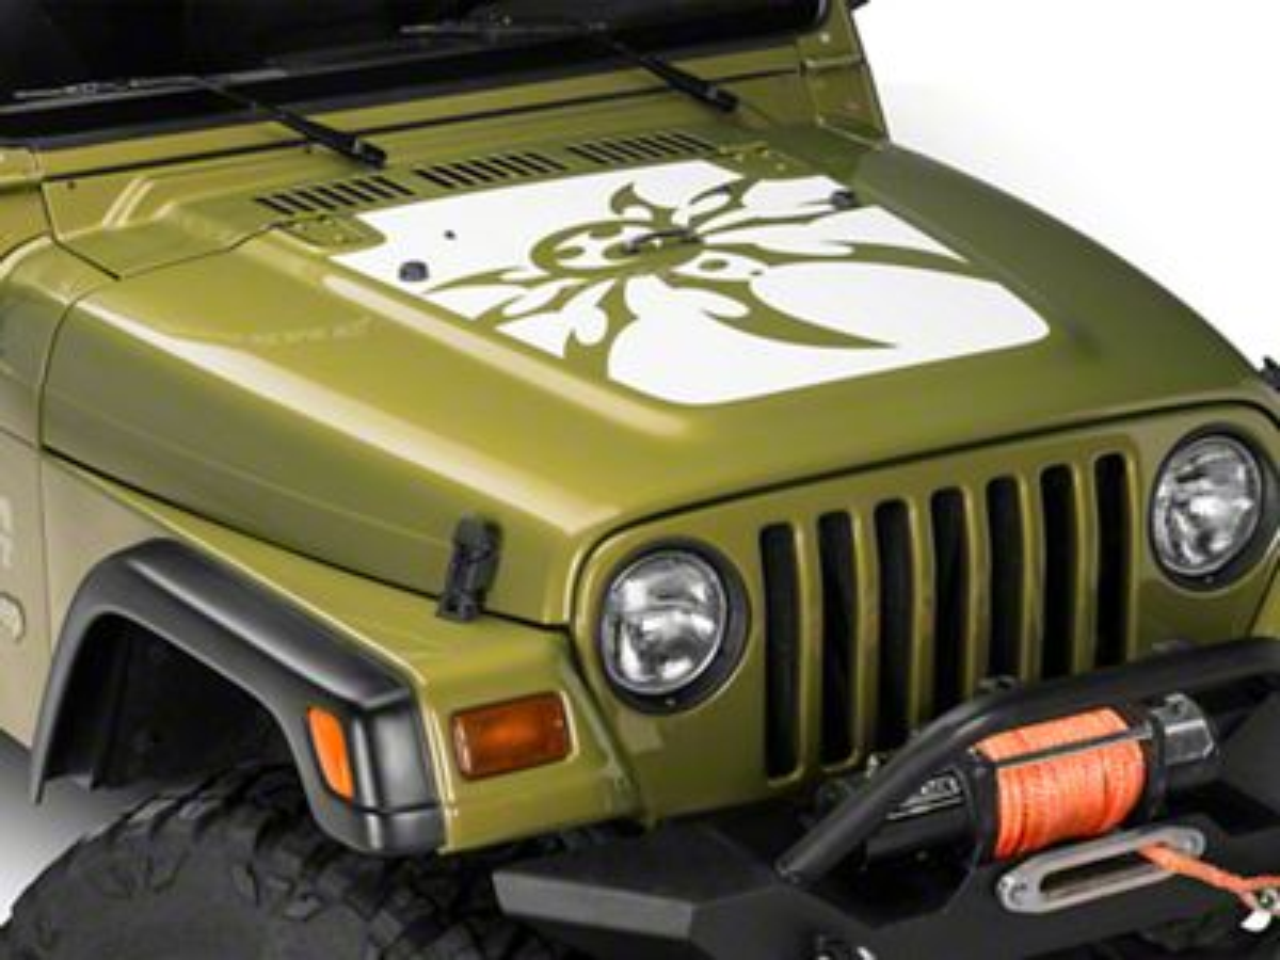 Poison Spyder Mountain Spyder Hood Decal - White (97-06 Jeep Wrangler TJ)